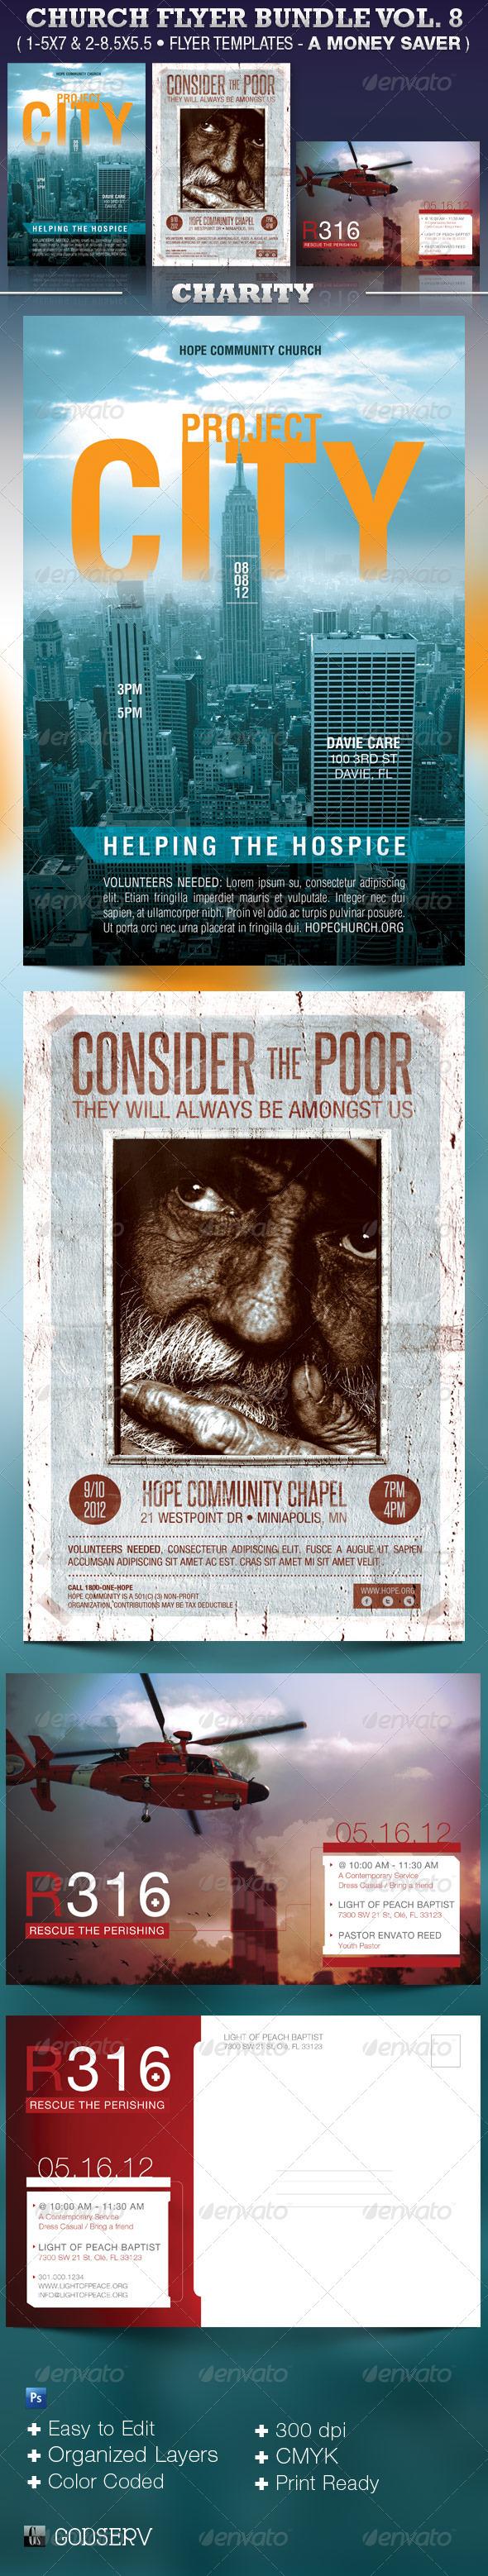 Charity Church Flyer Template Bundle - Church Flyers